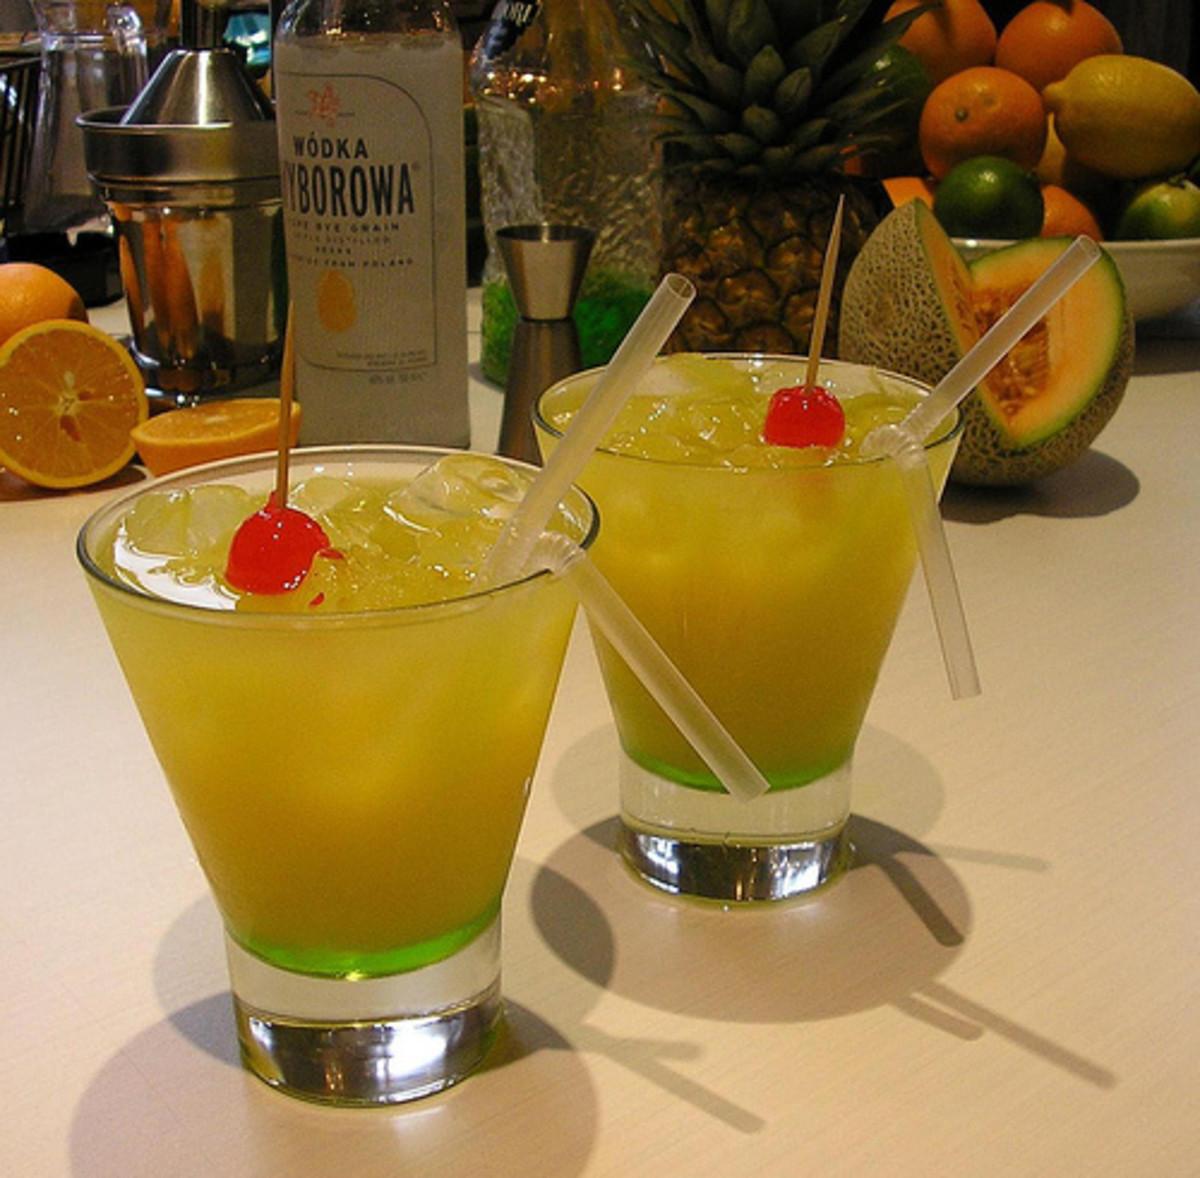 Melon Ball Cocktail Drinks photo: Drunken Monkey @flickr